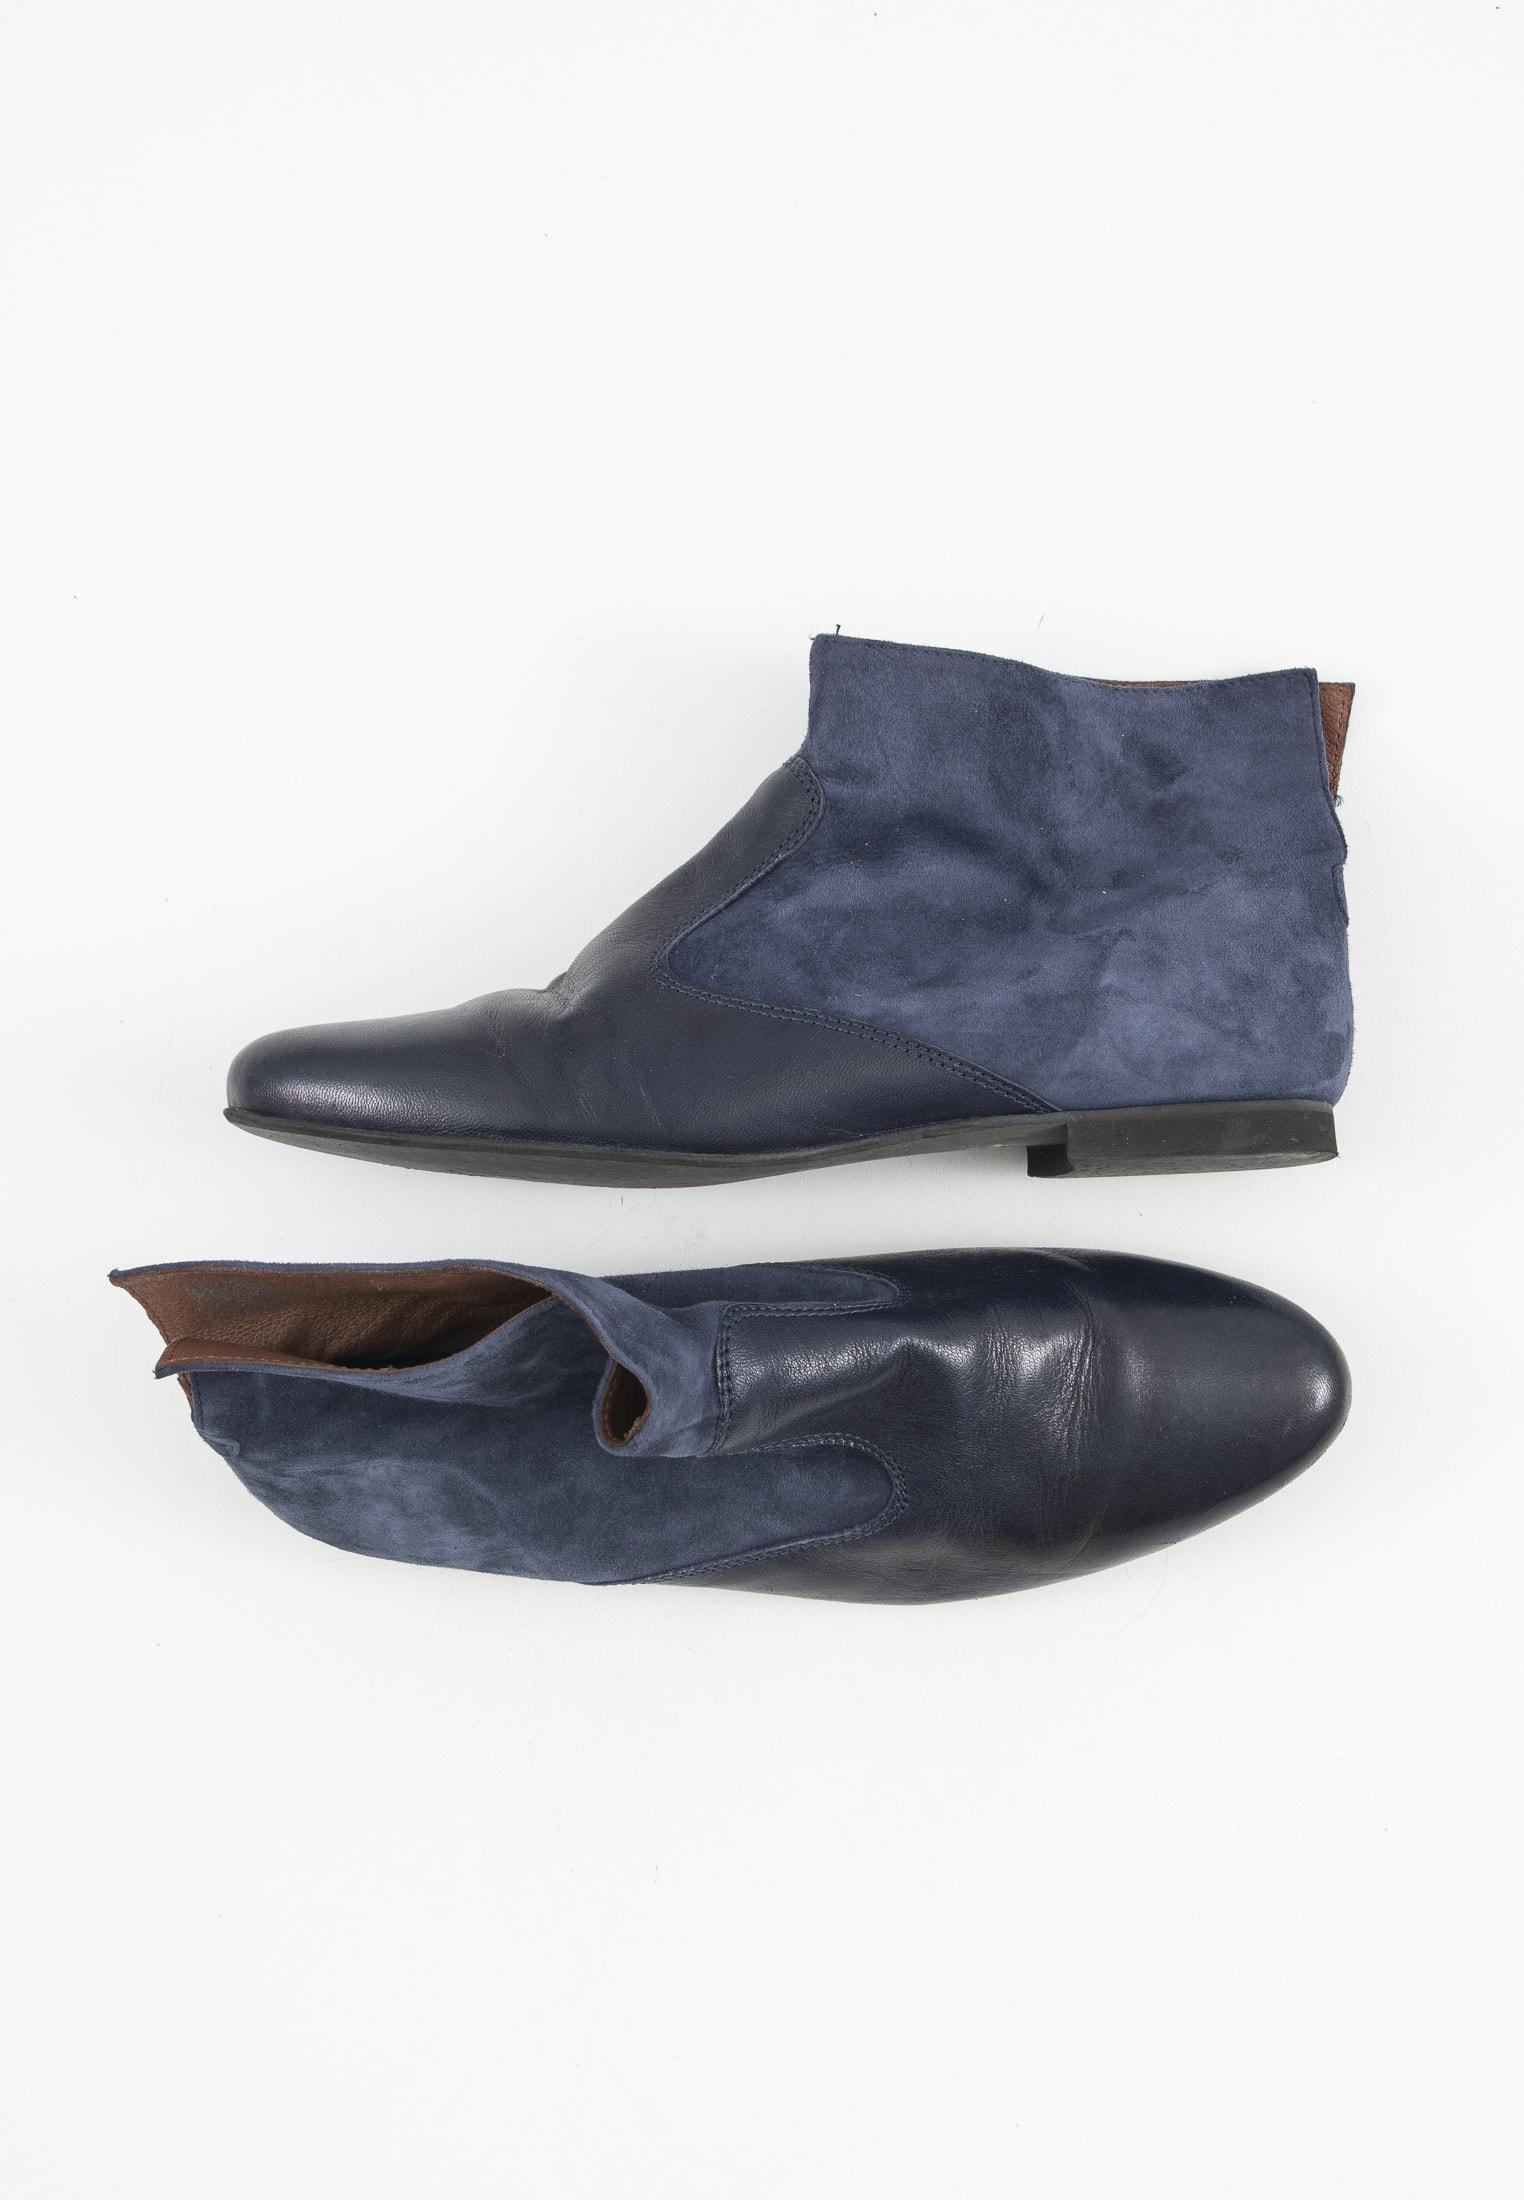 BOCAGE Stiefel / Stiefelette / Boots Blau Gr.40